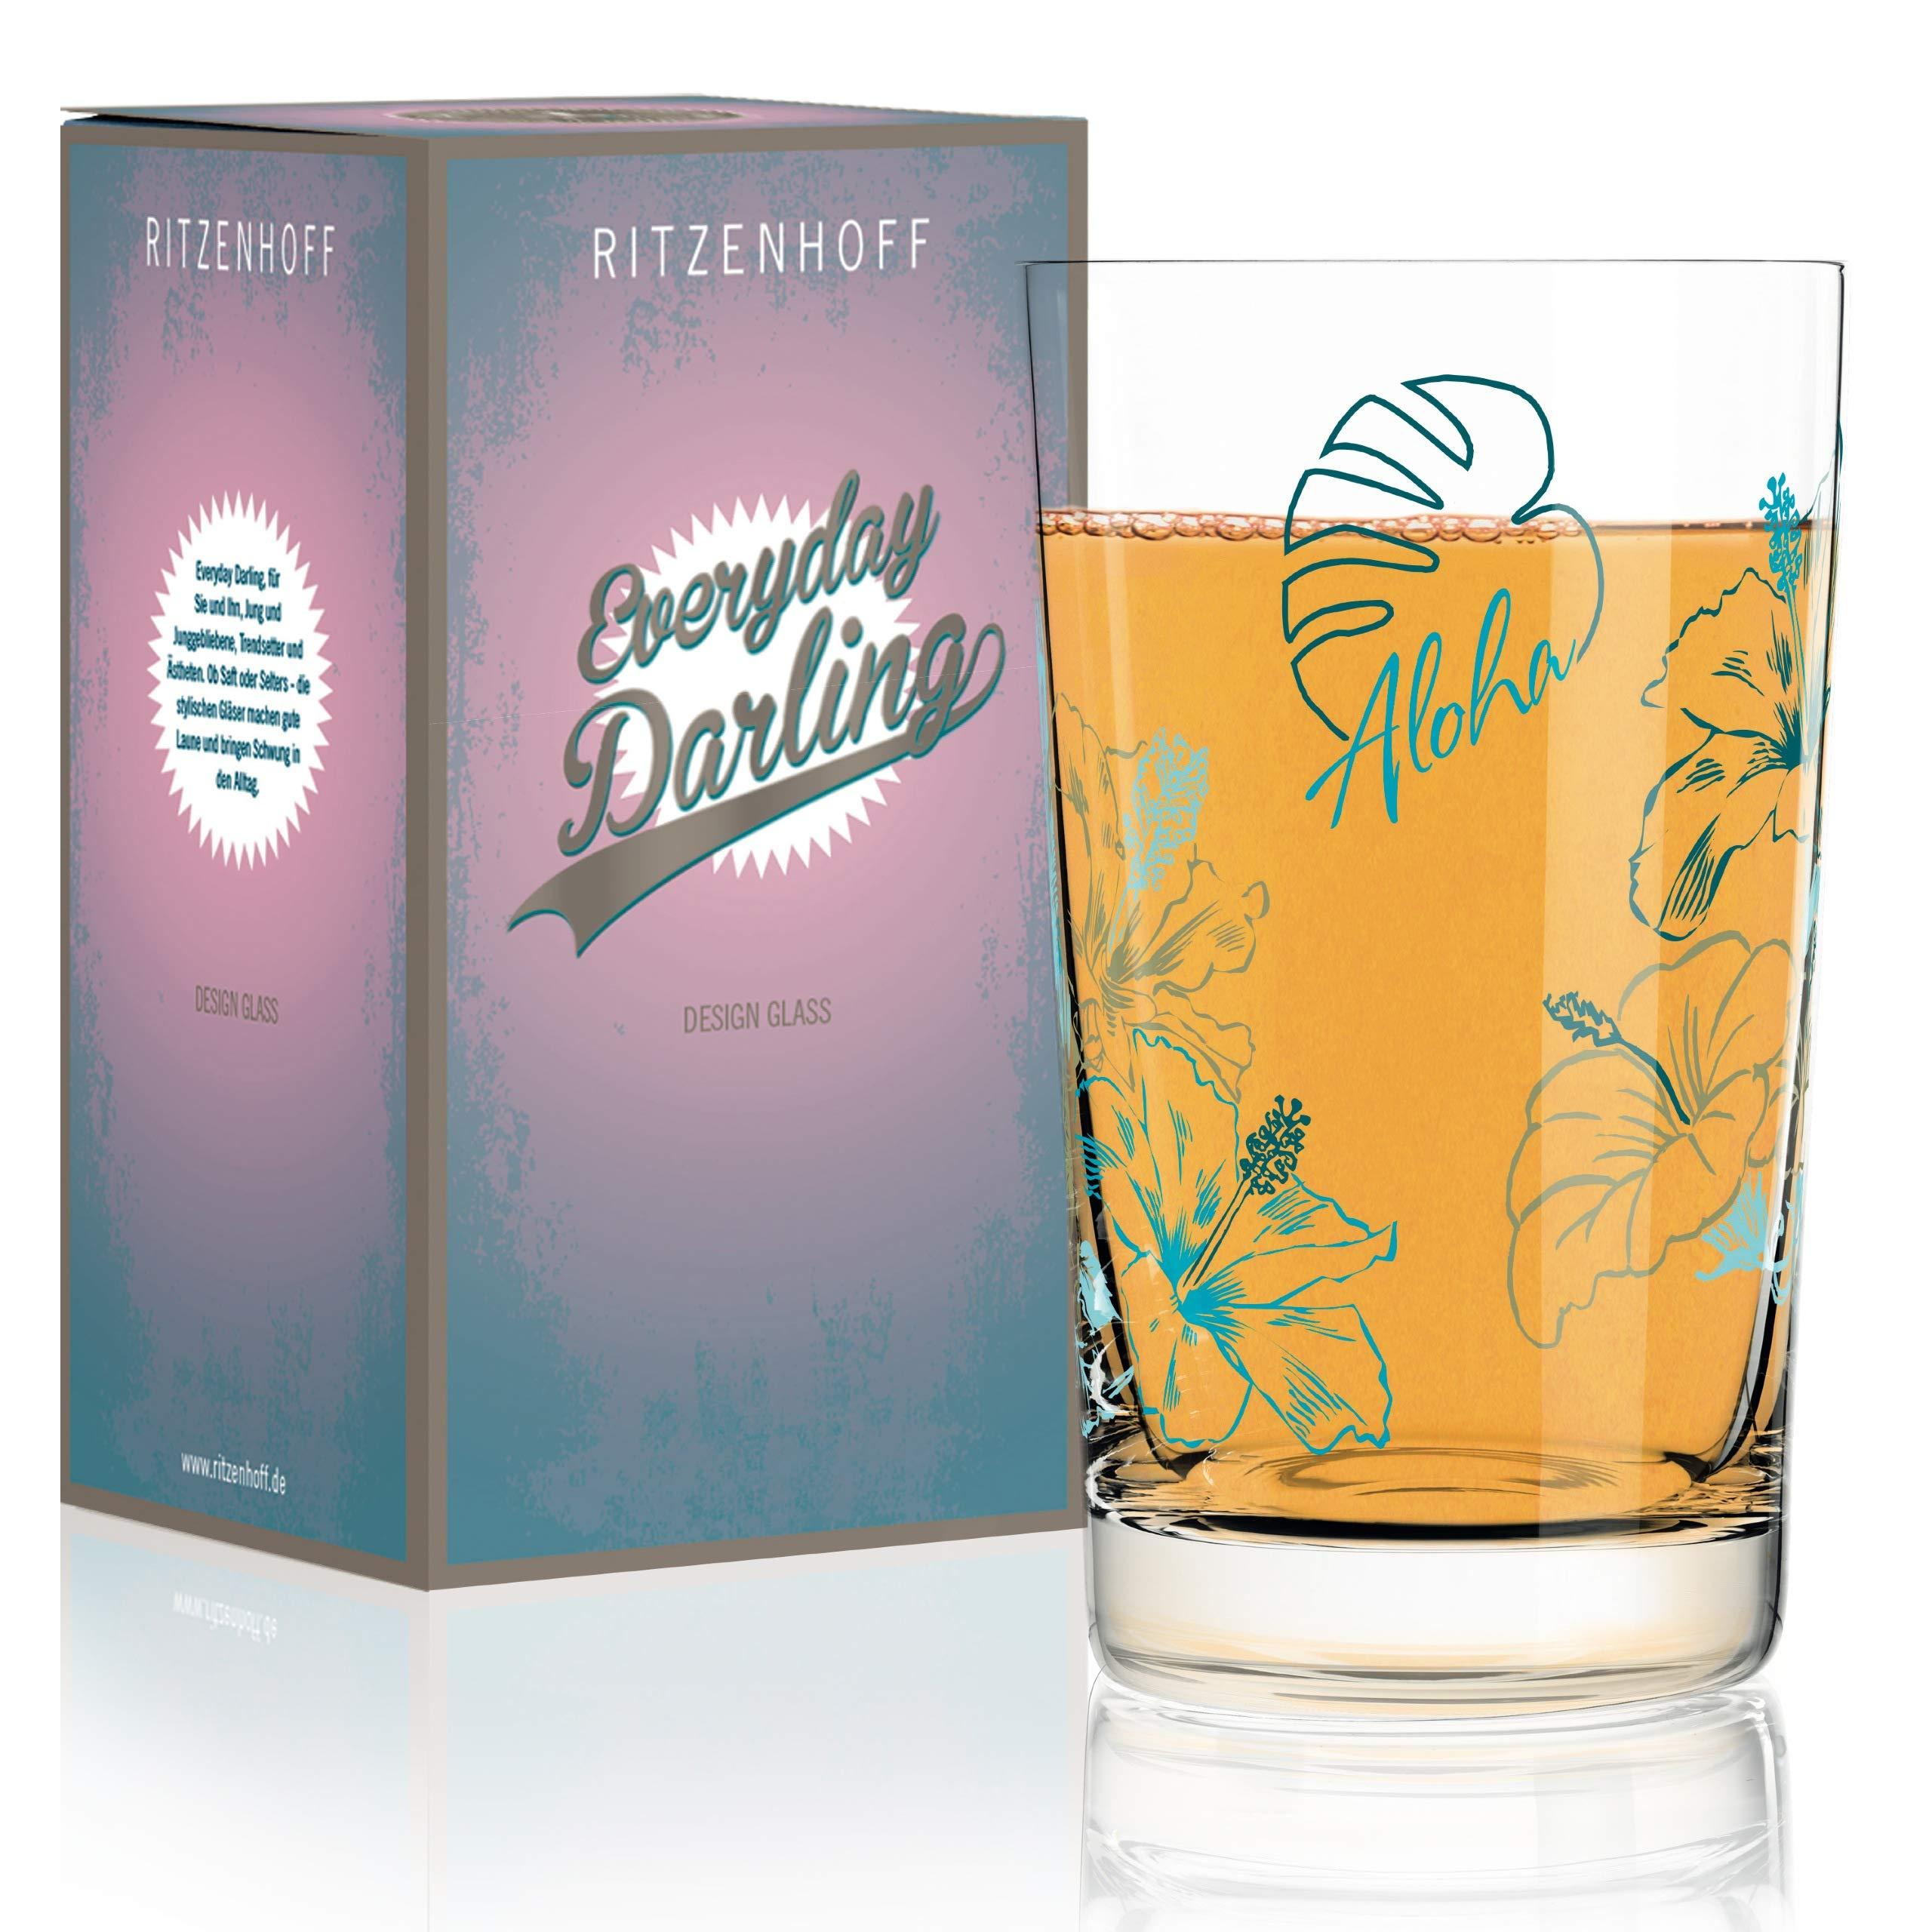 RITZENHOFF Everyday Darling 3270027 Drinking Glass Crystal 300 ml by Ritzenhoff (Image #1)